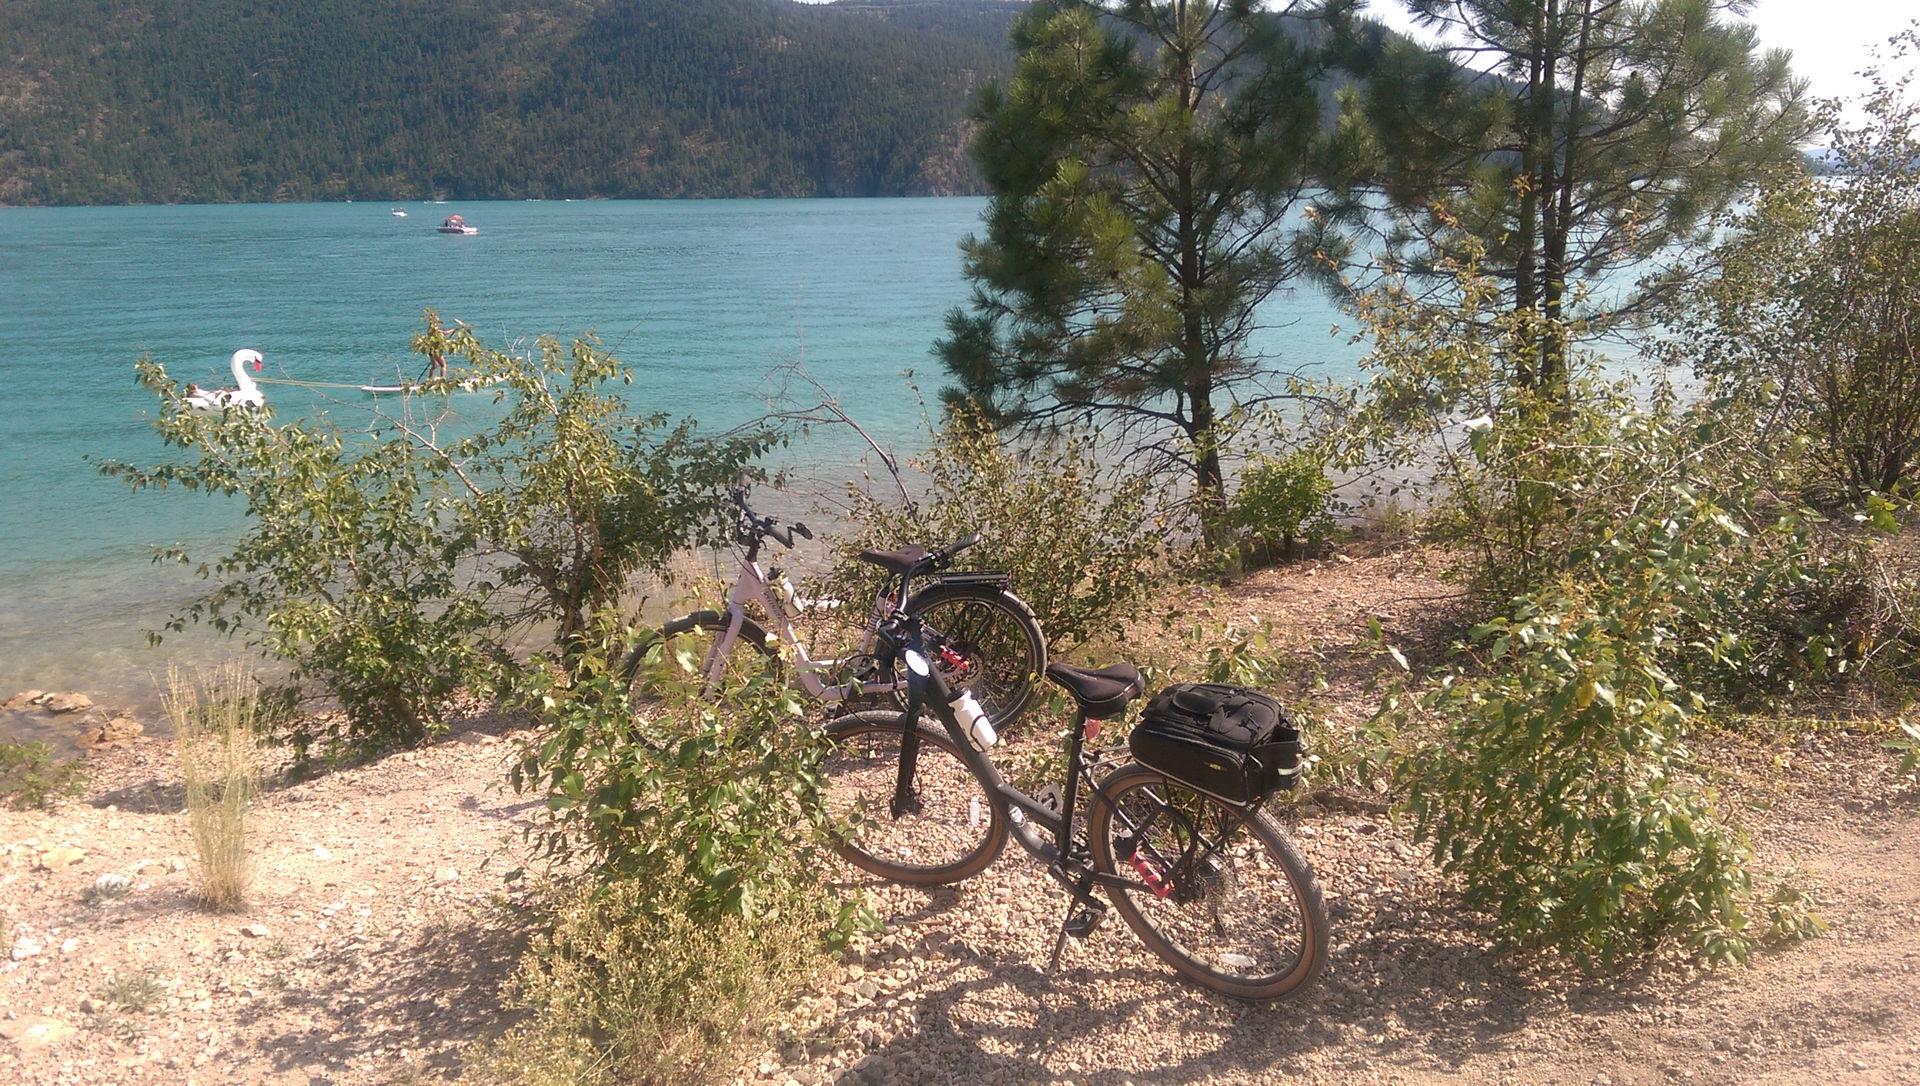 Bikes by the lake